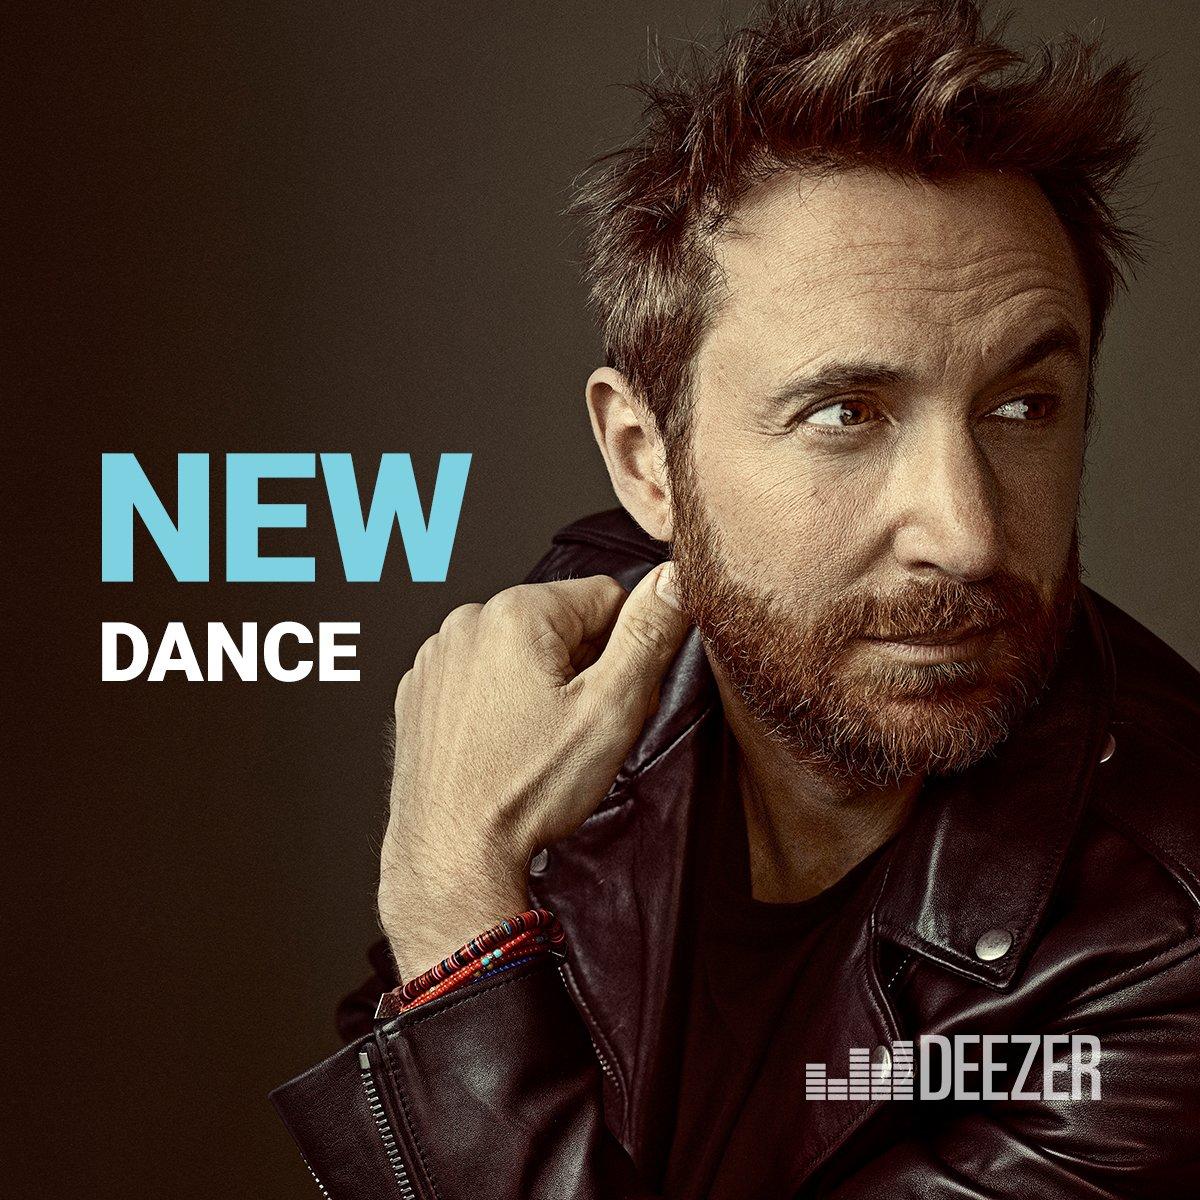 Thanks @Deezer for the cover of NEW DANCE Playlist ➡️https://t.co/IC0y1C2oFT https://t.co/8IzTv4qDkC